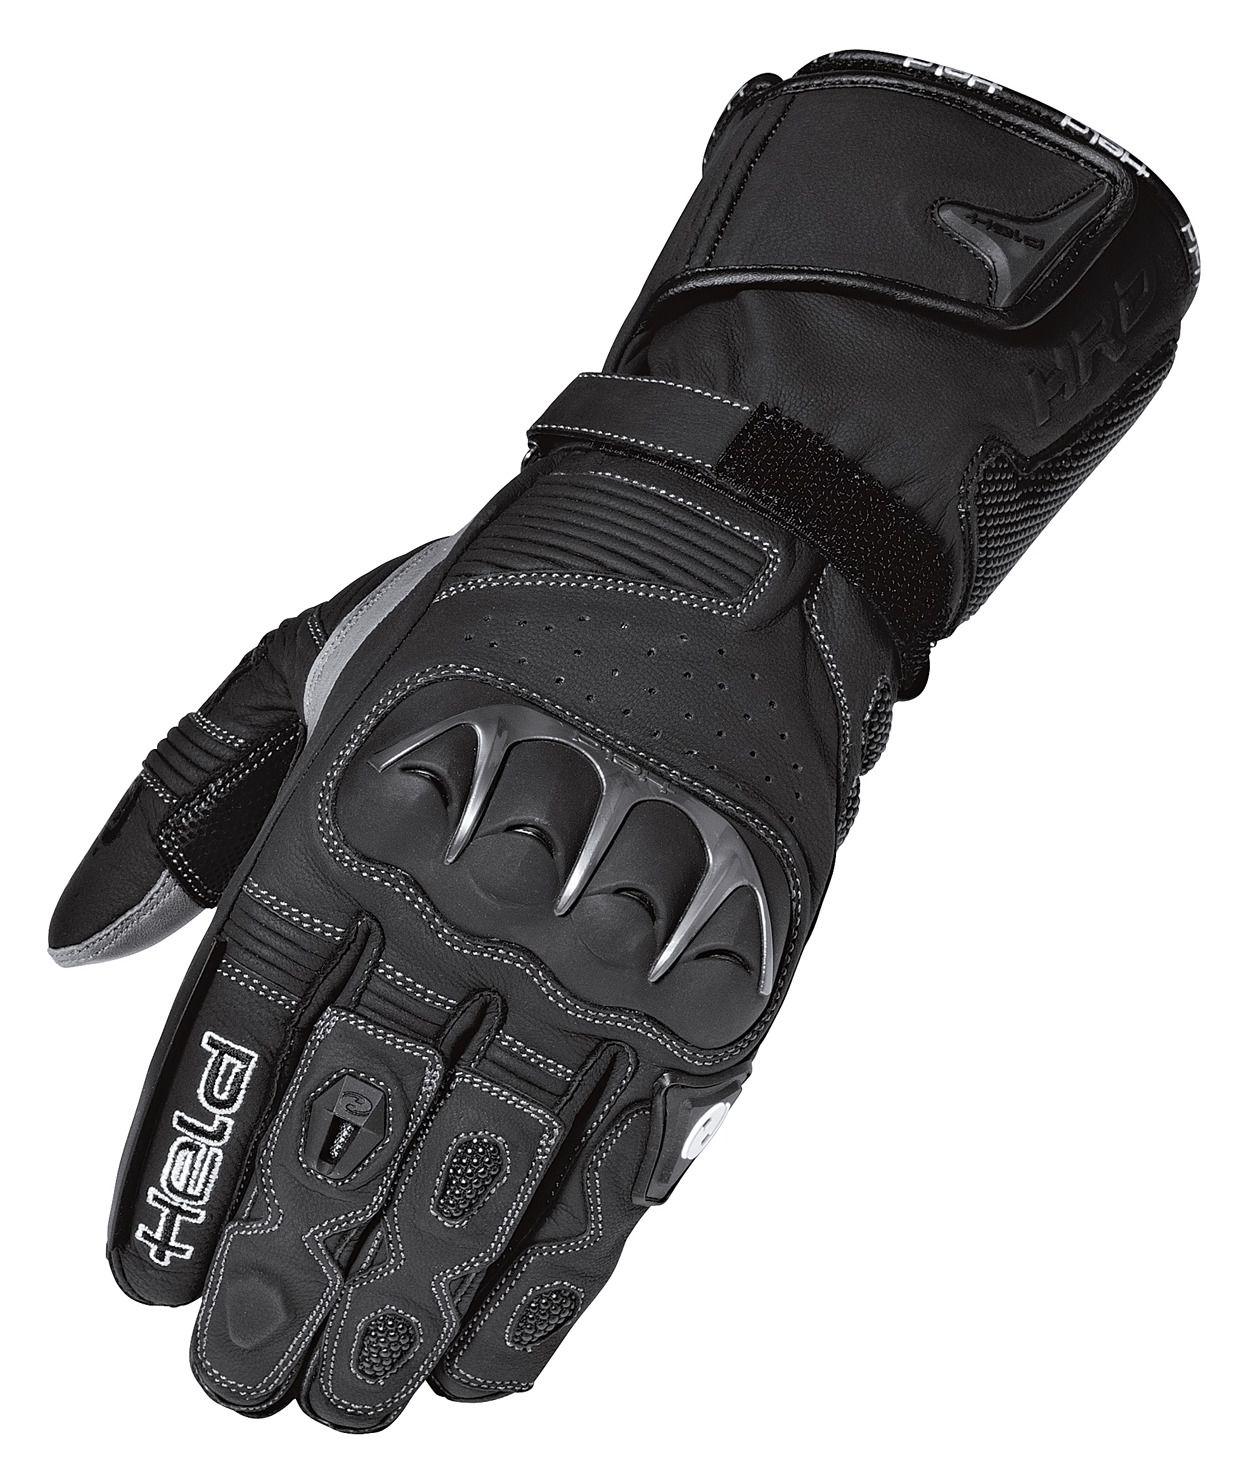 Motorcycle gloves external seams - Motorcycle Gloves External Seams 1